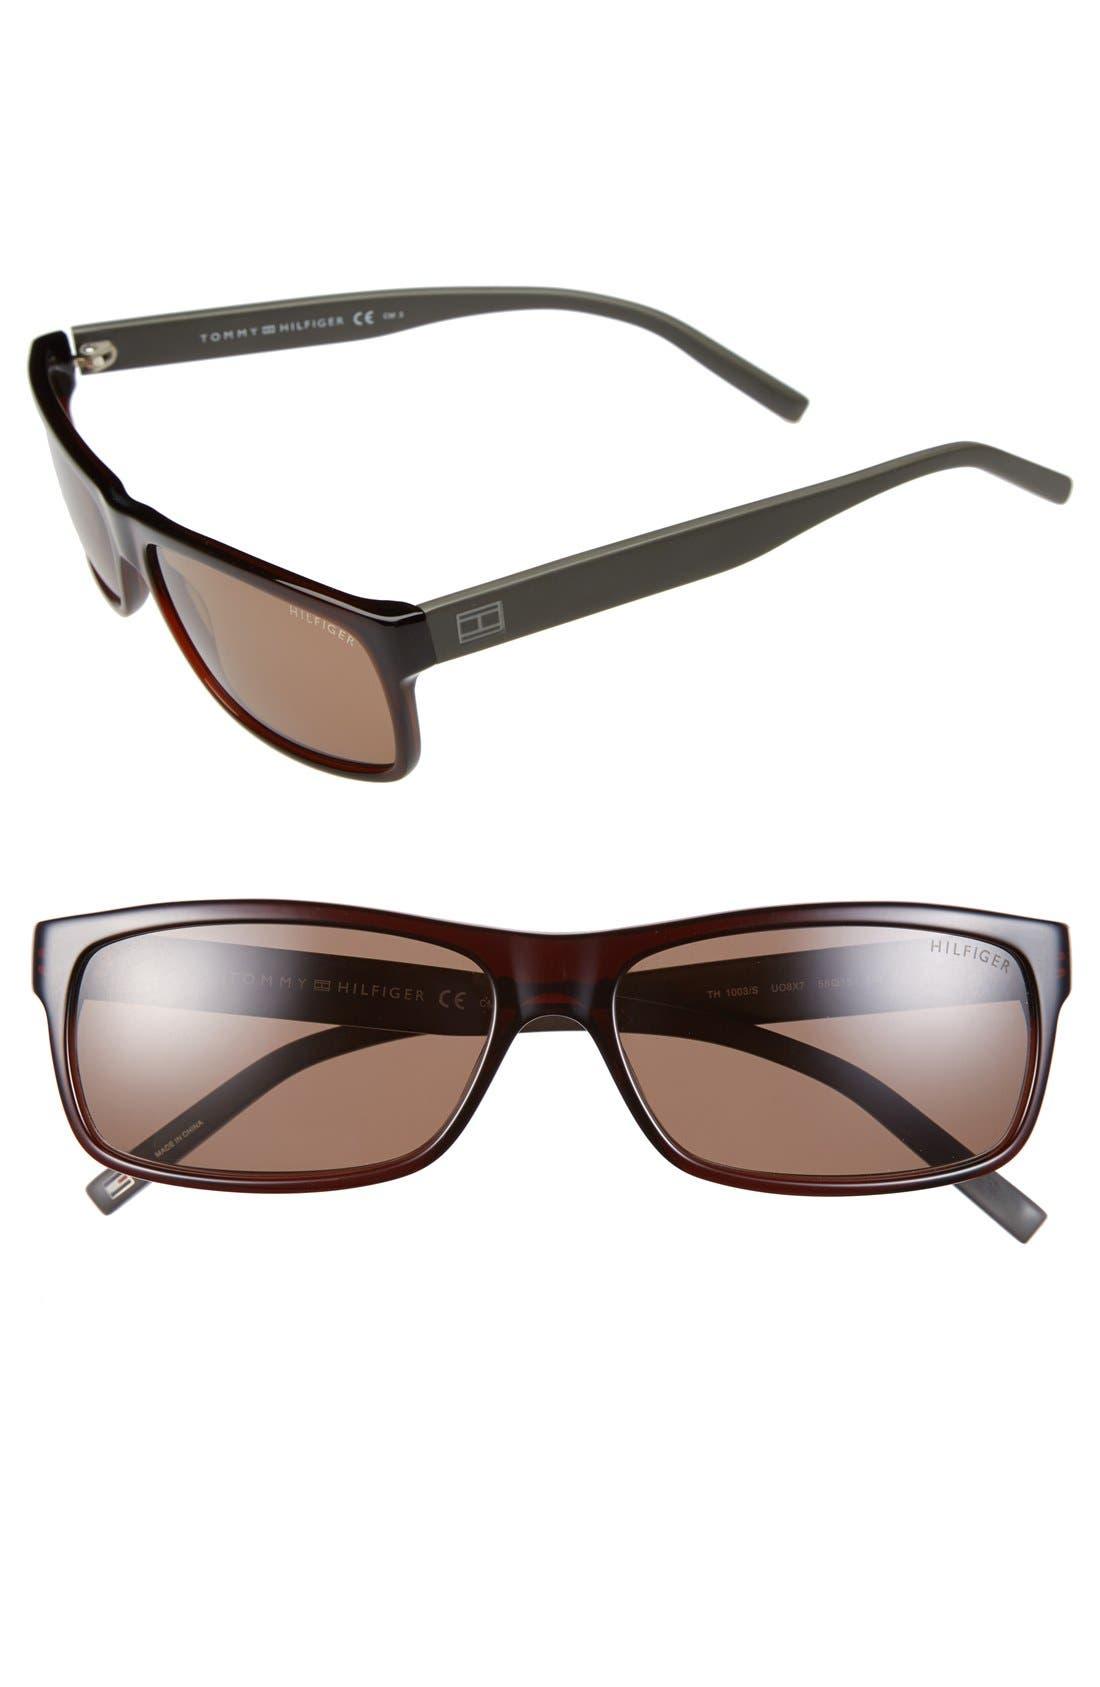 Main Image - Tommy Hilfiger 58mm Polarized Sunglasses